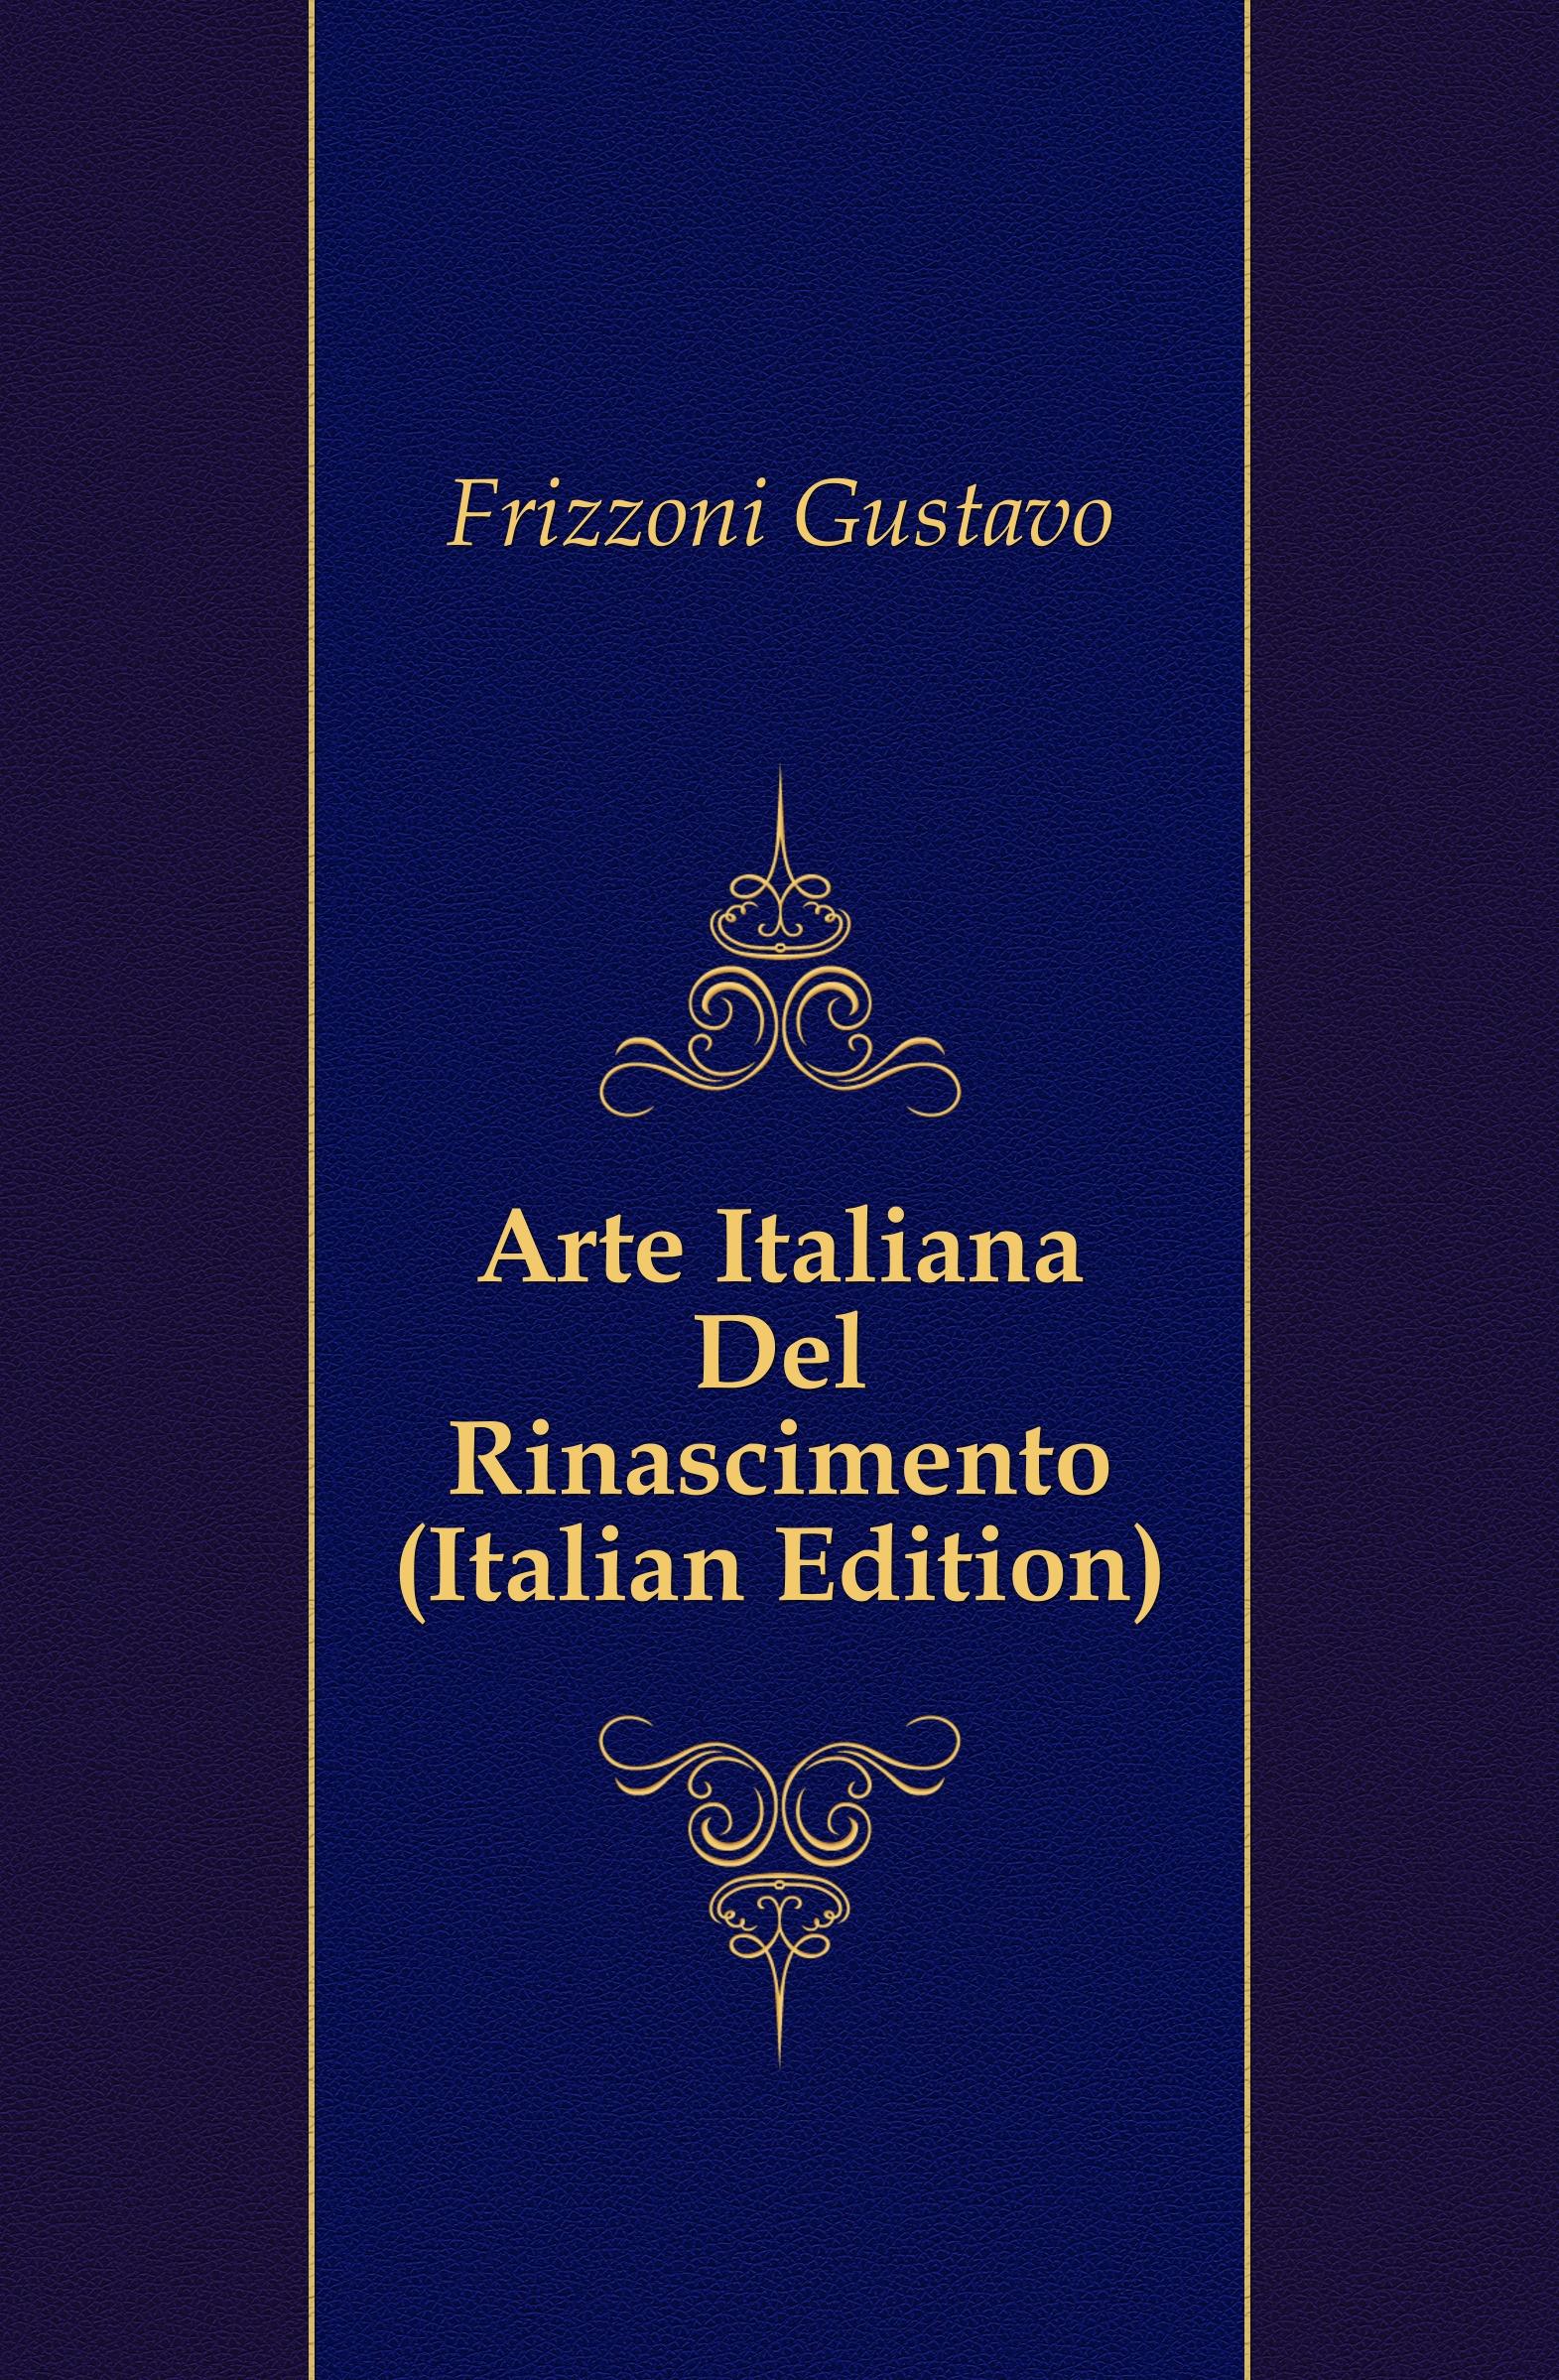 Frizzoni Gustavo Arte Italiana Del Rinascimento (Italian Edition) некрасова м большая книга ужасов 2018